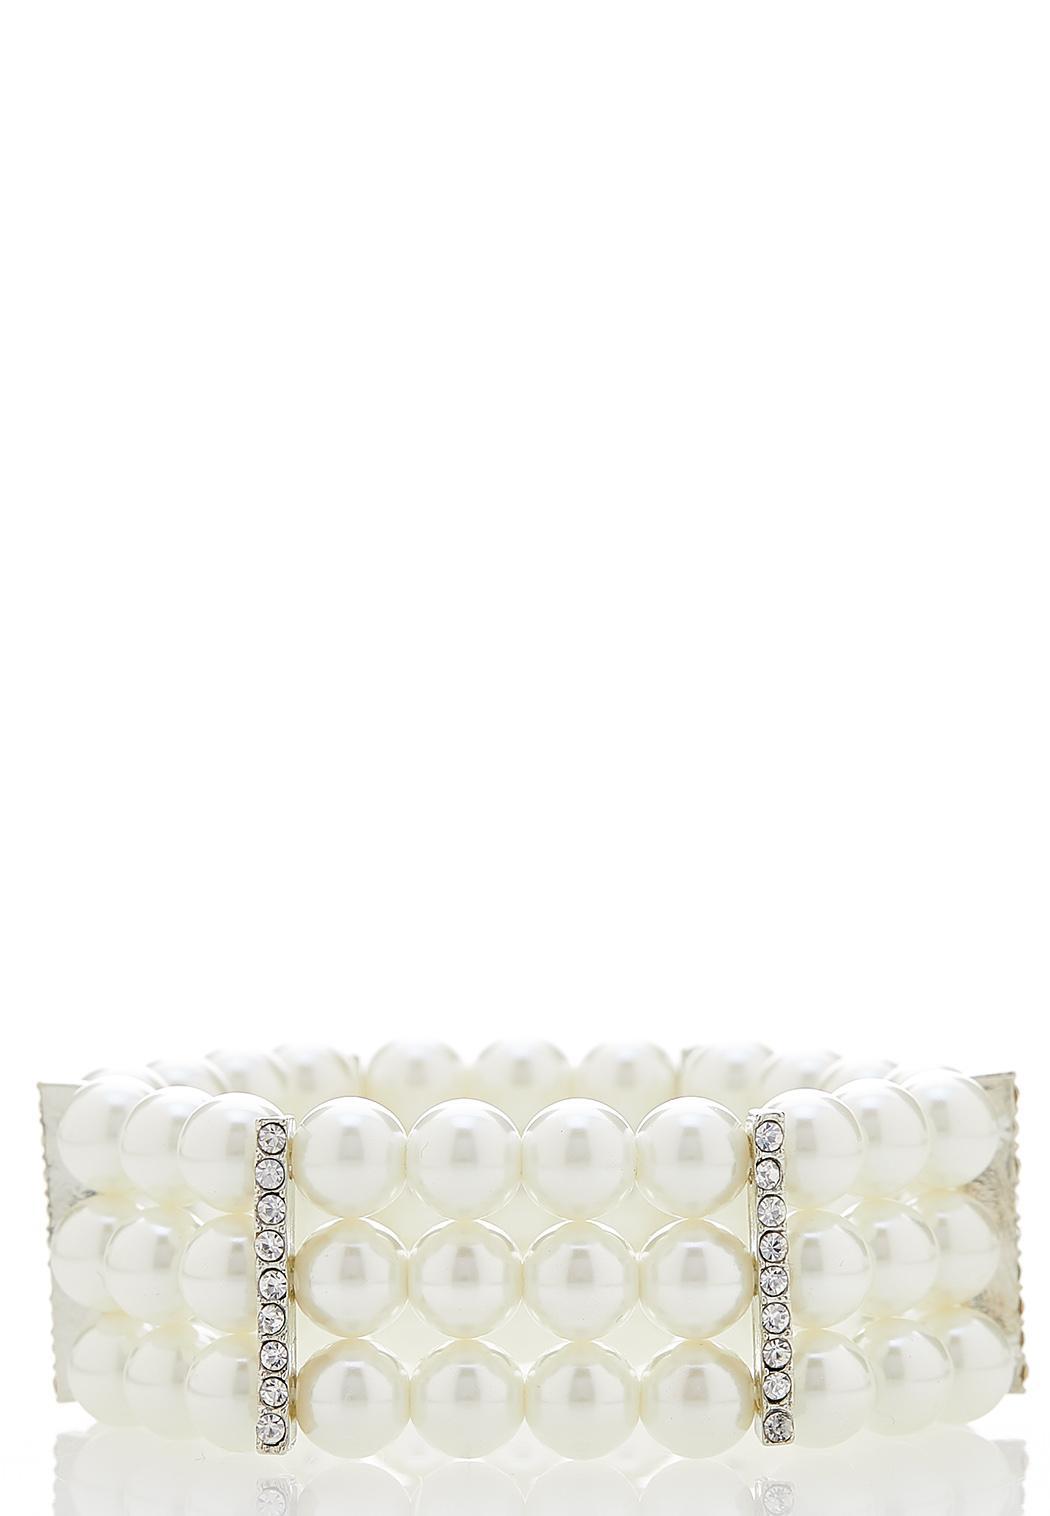 Vintage Glam Stretch Bracelet